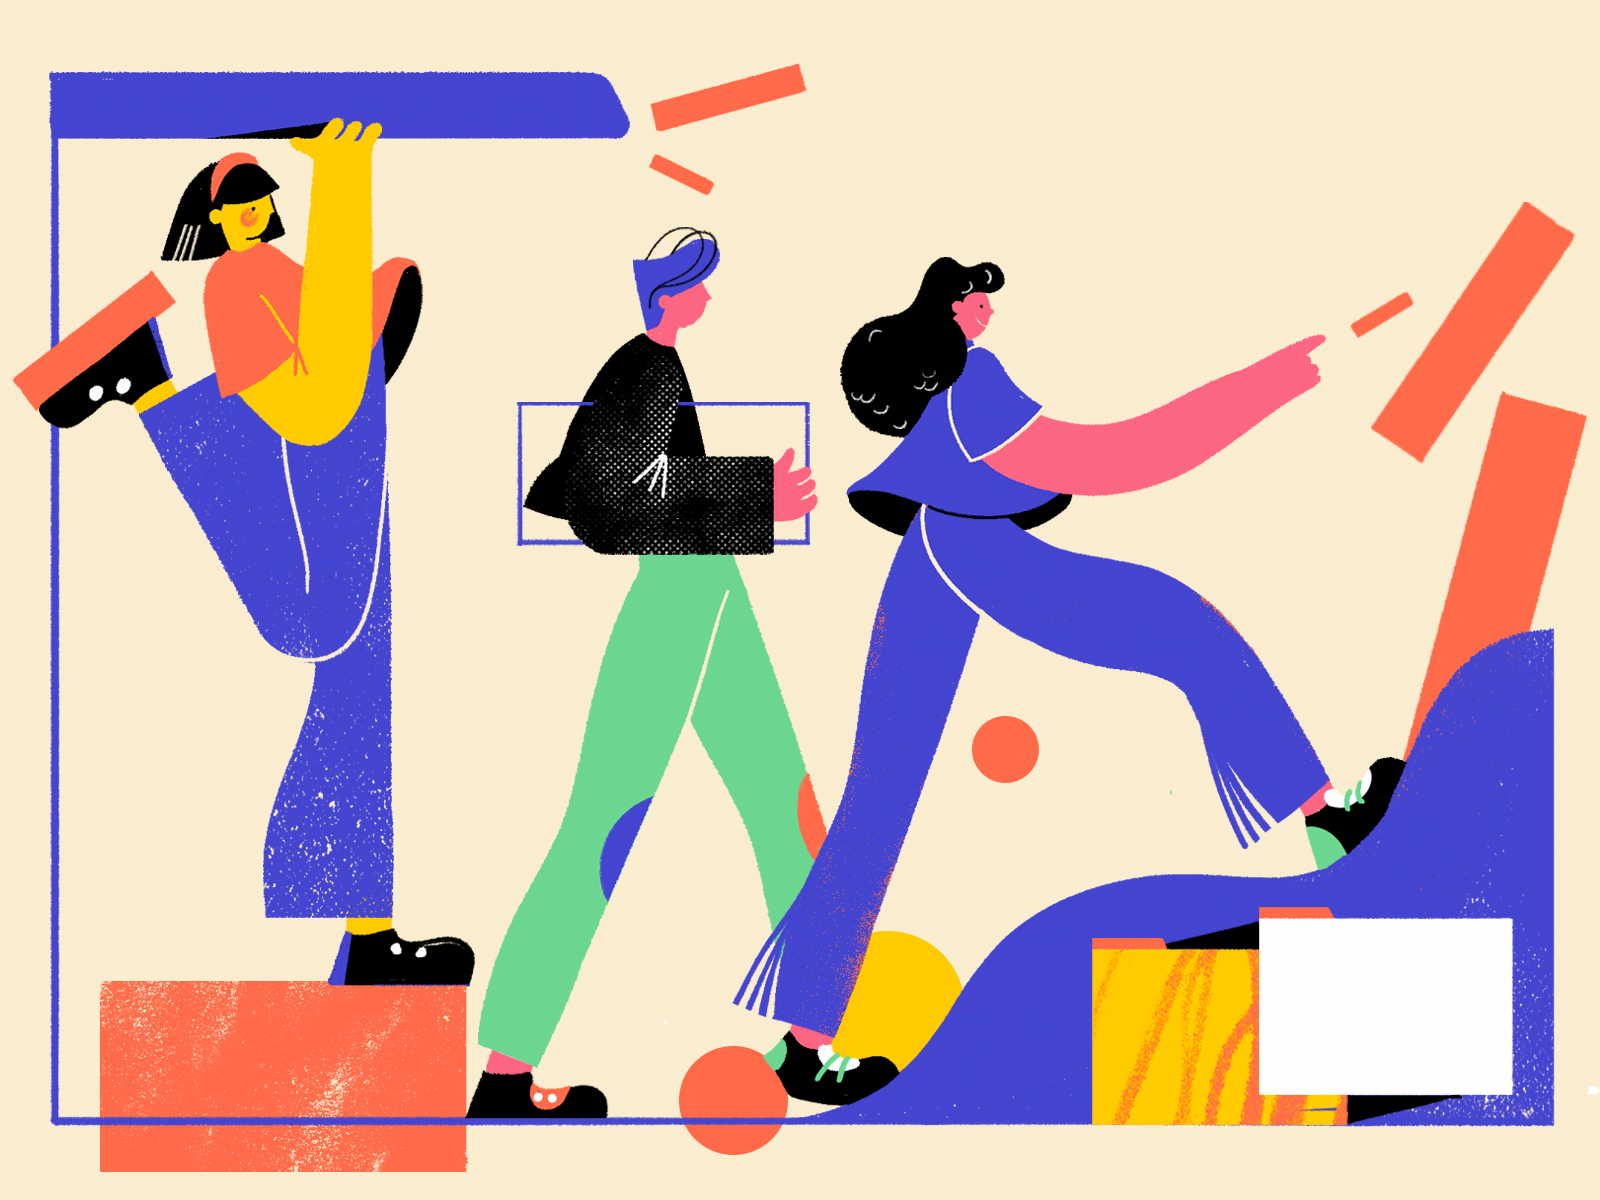 Designer Way Illustration by tubik.arts